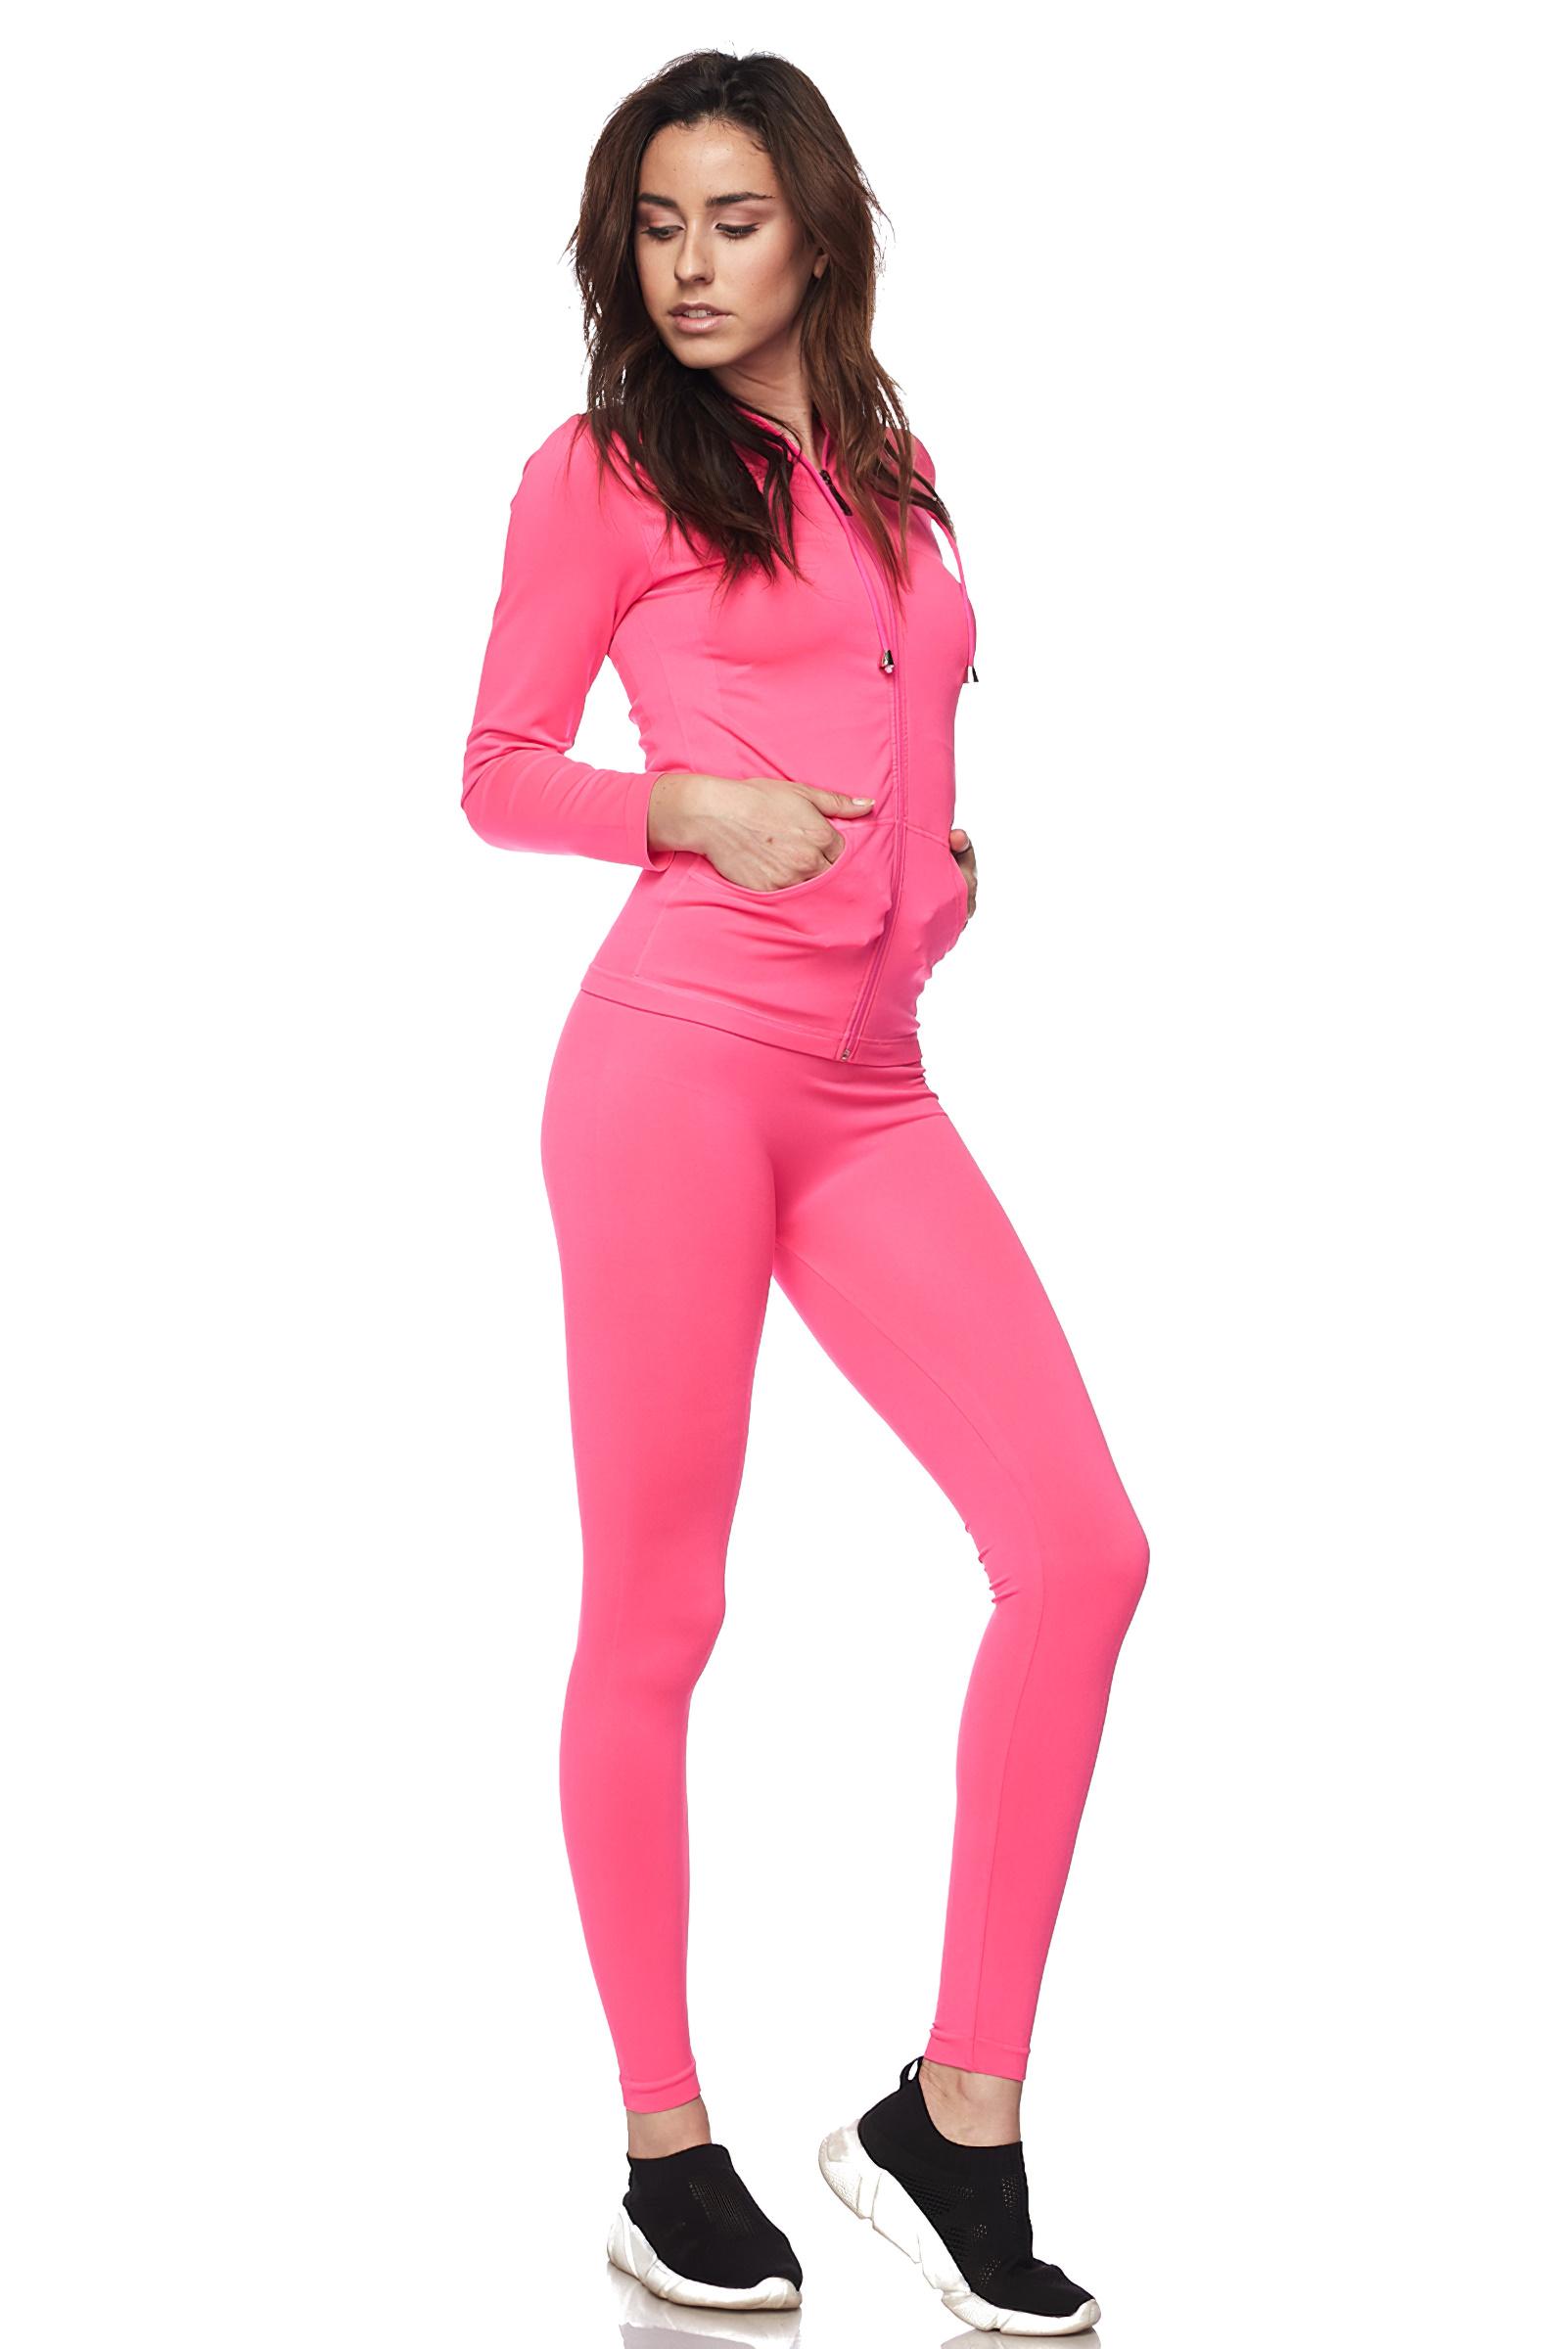 Women-039-s-Juniors-Active-Set-Wear-Zip-Up-Hoodie-and-Legging thumbnail 30